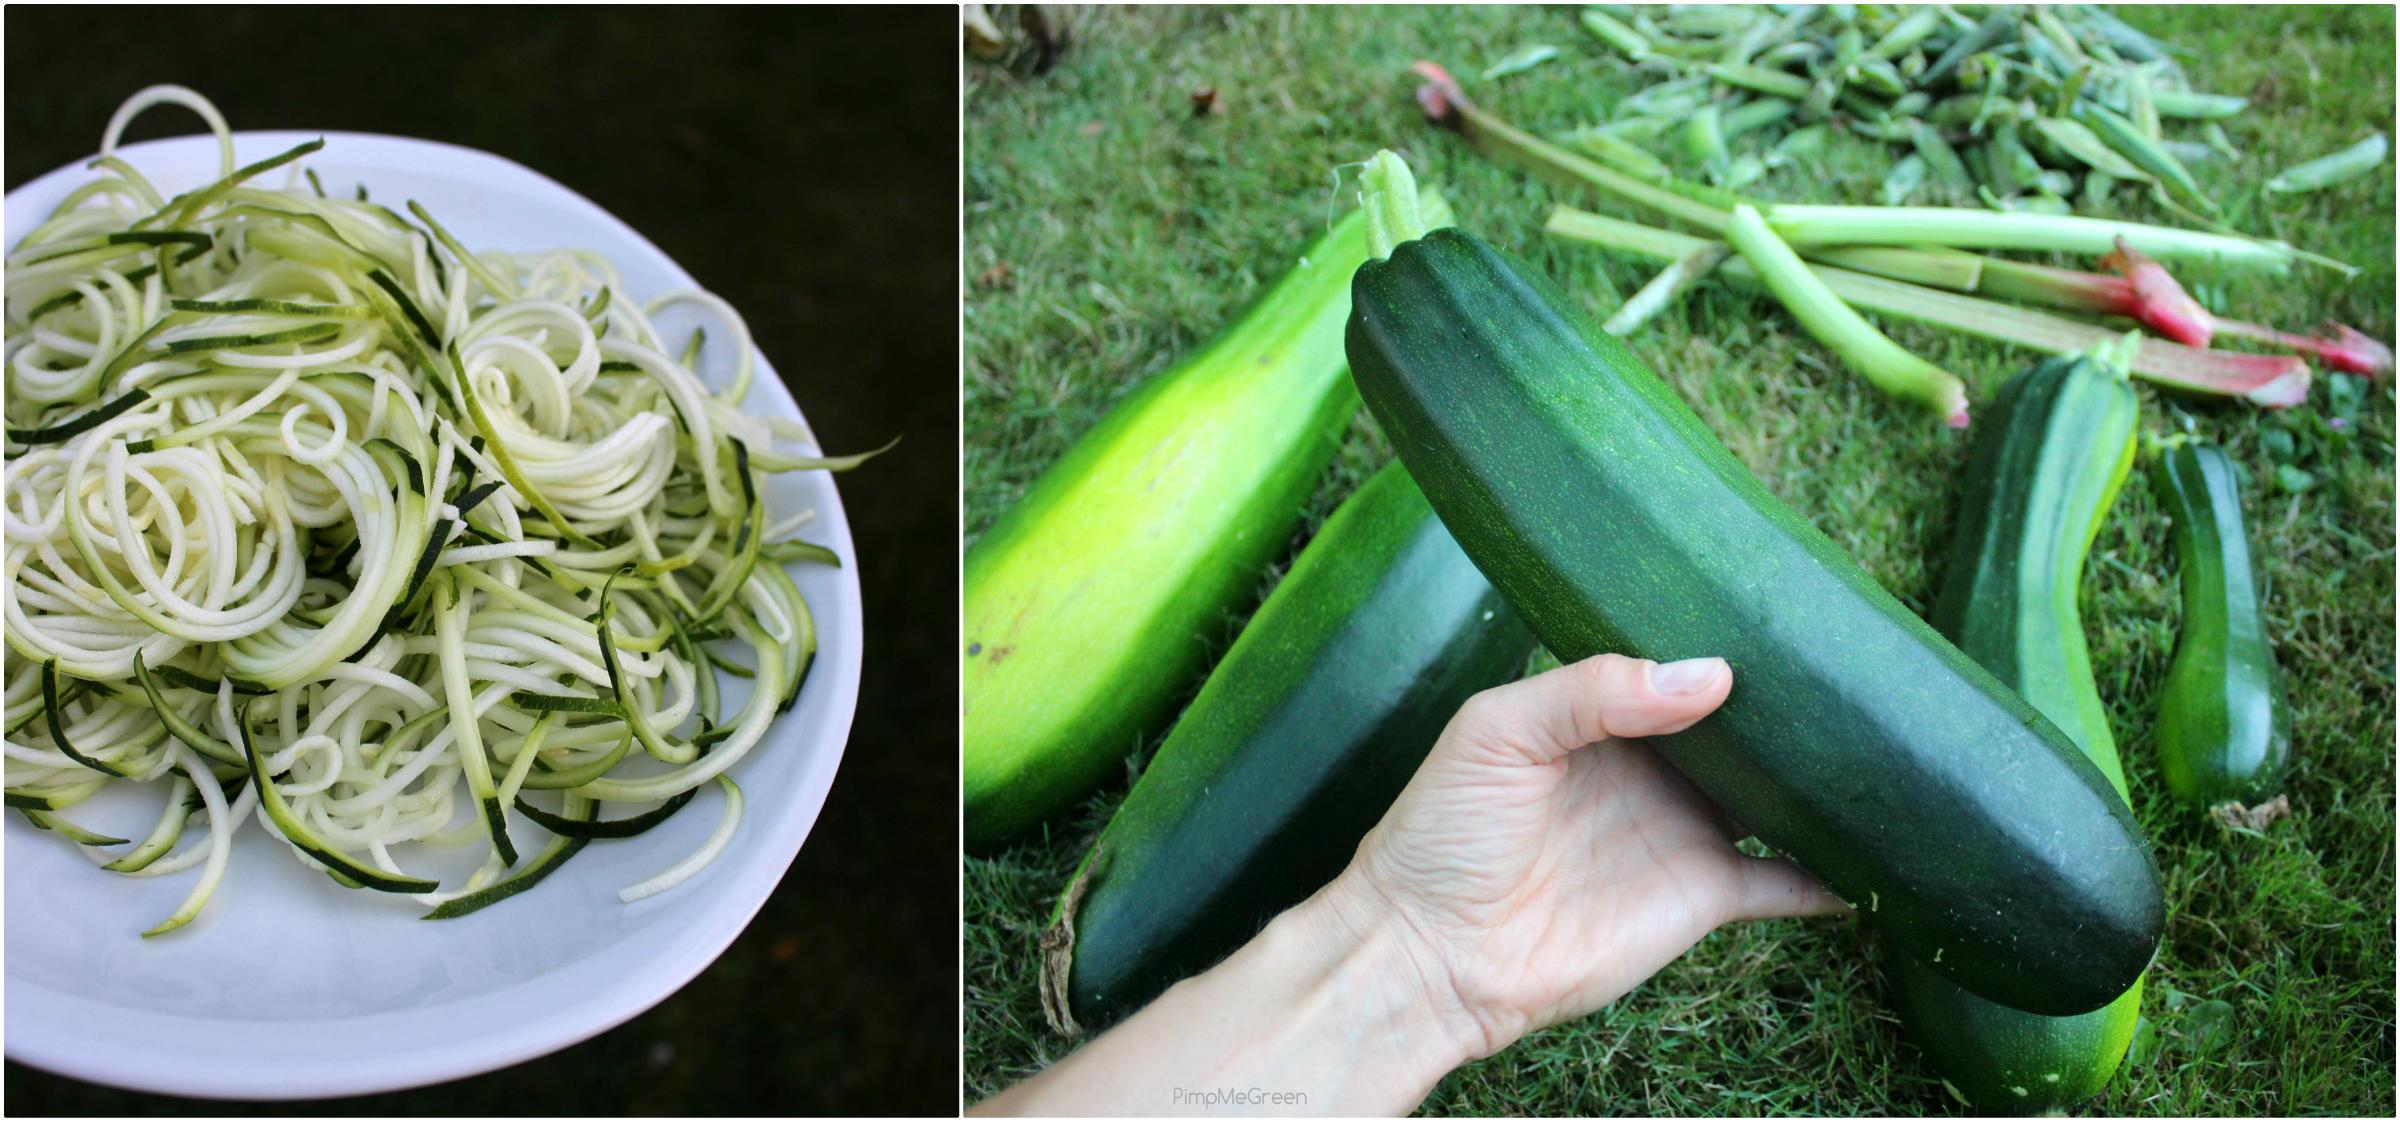 Zucchini Collage pmg